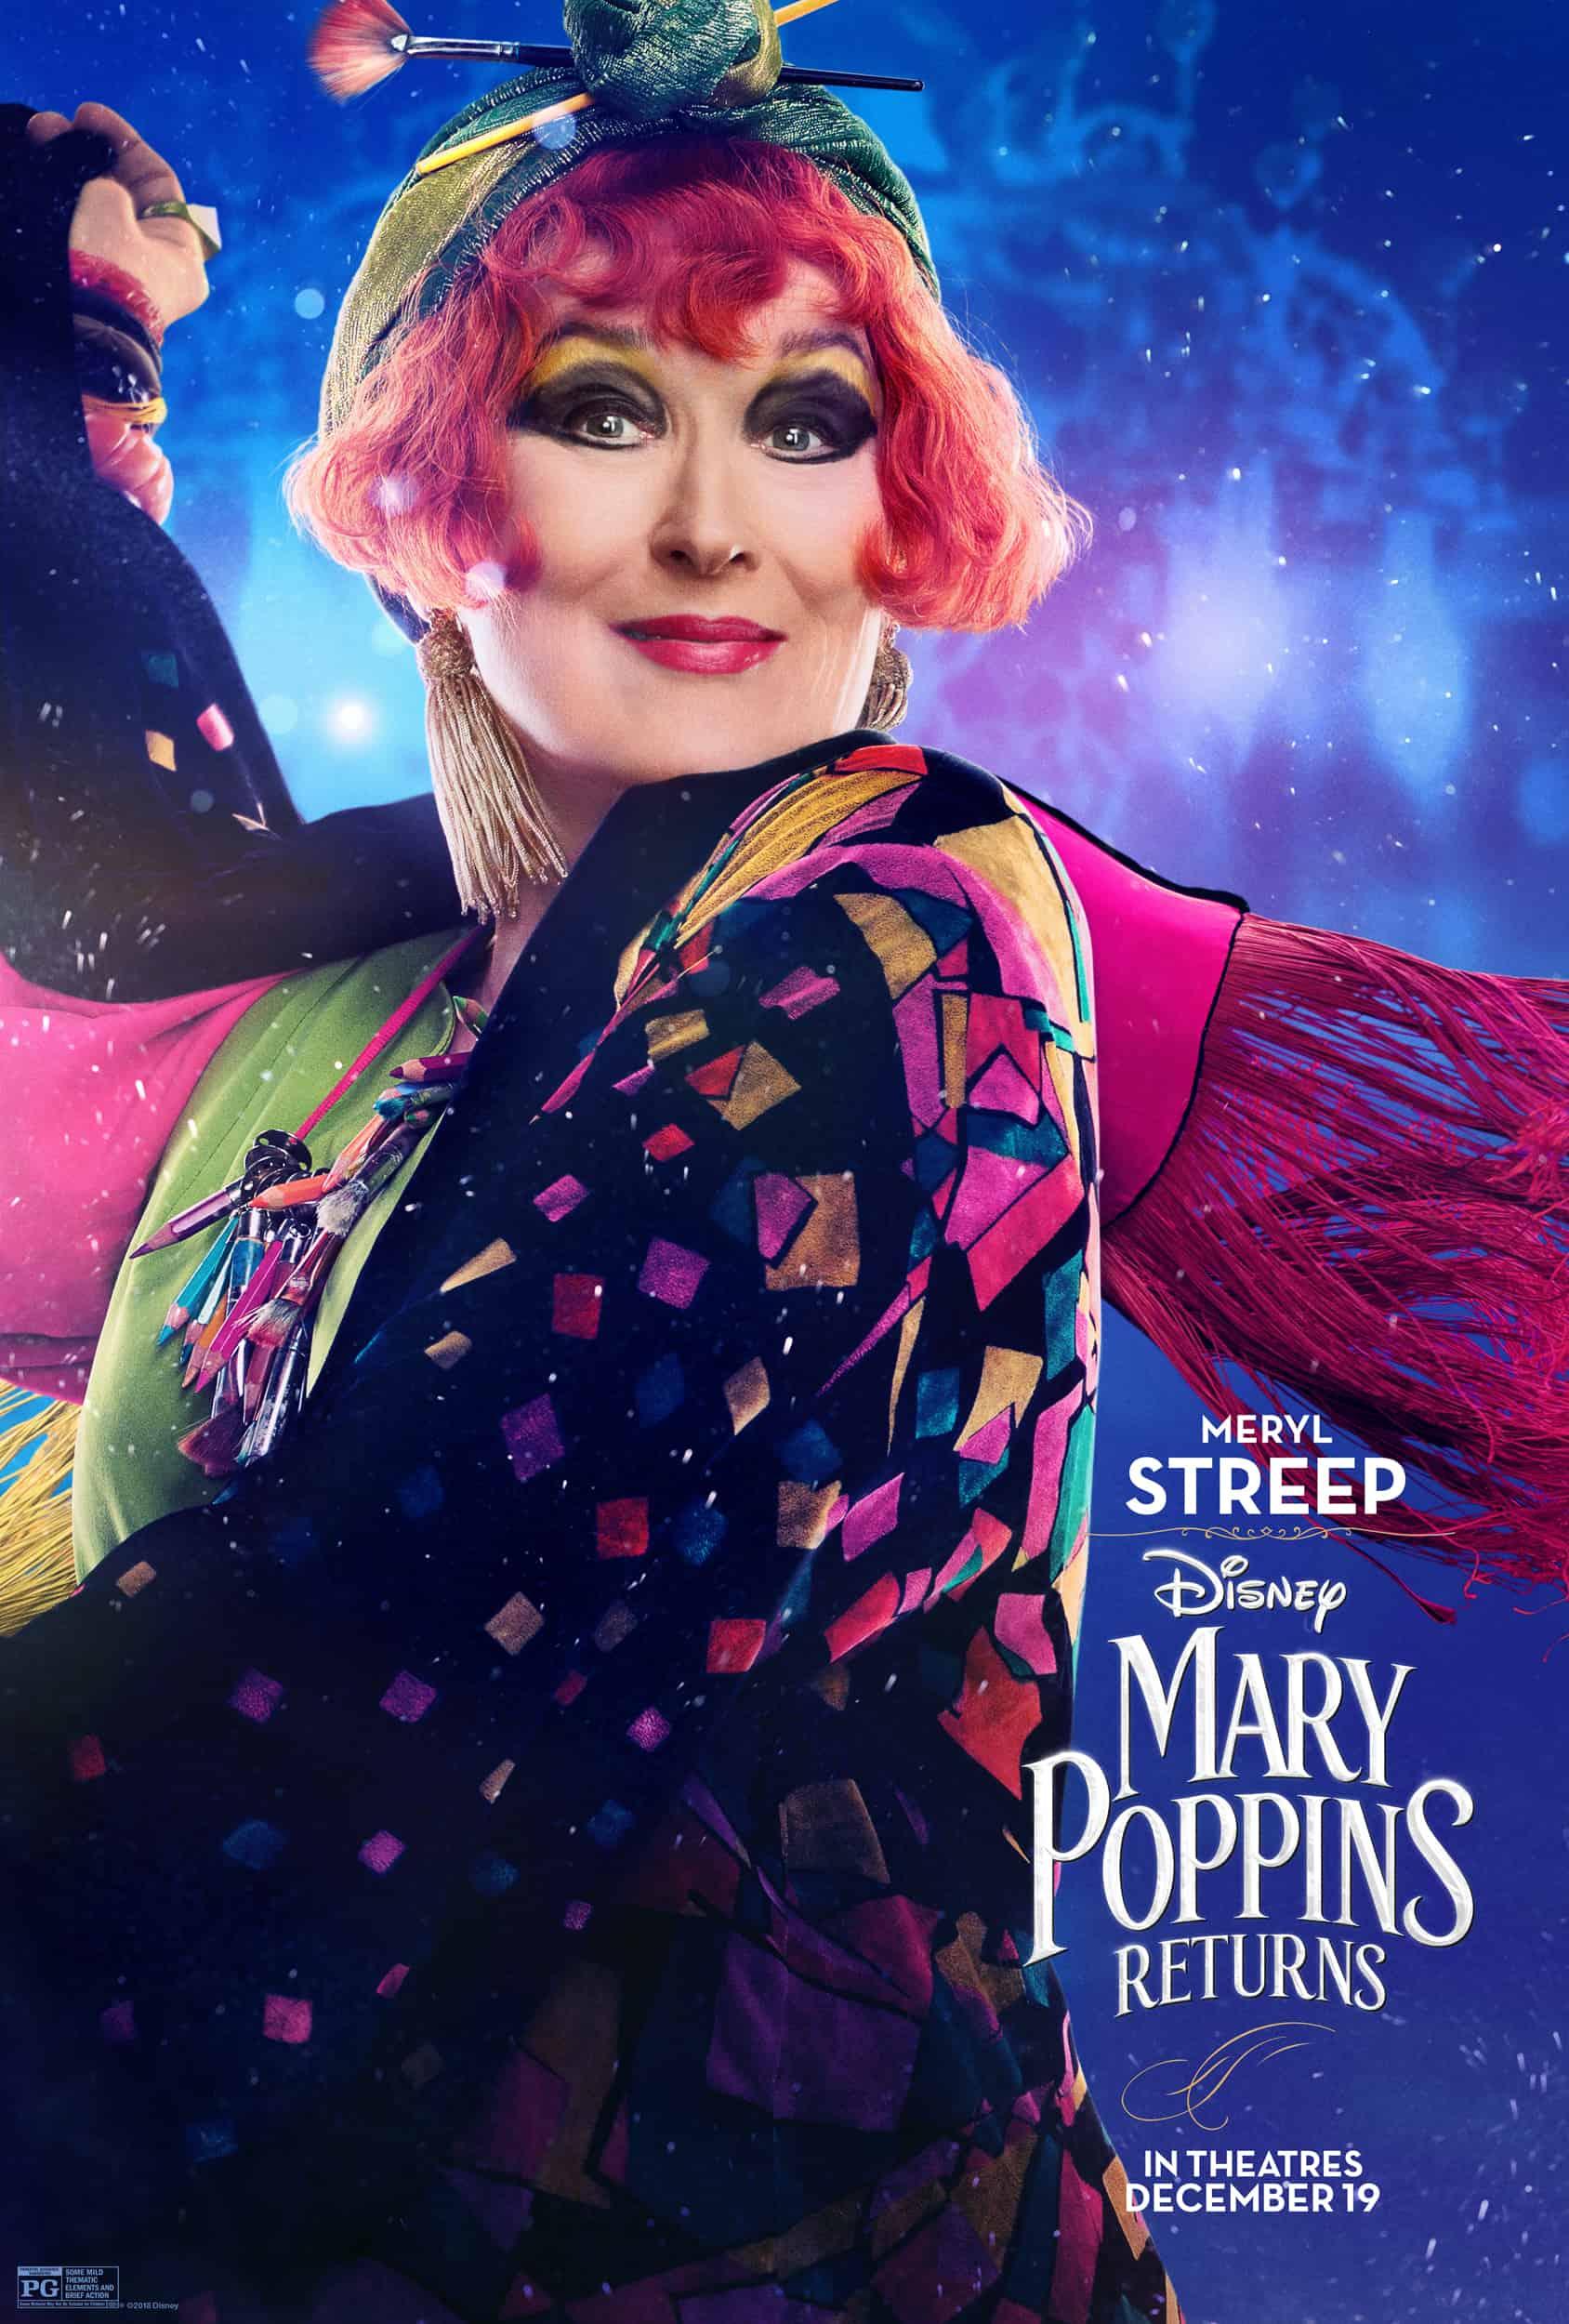 Meryl Streep in Mary Poppins Returns